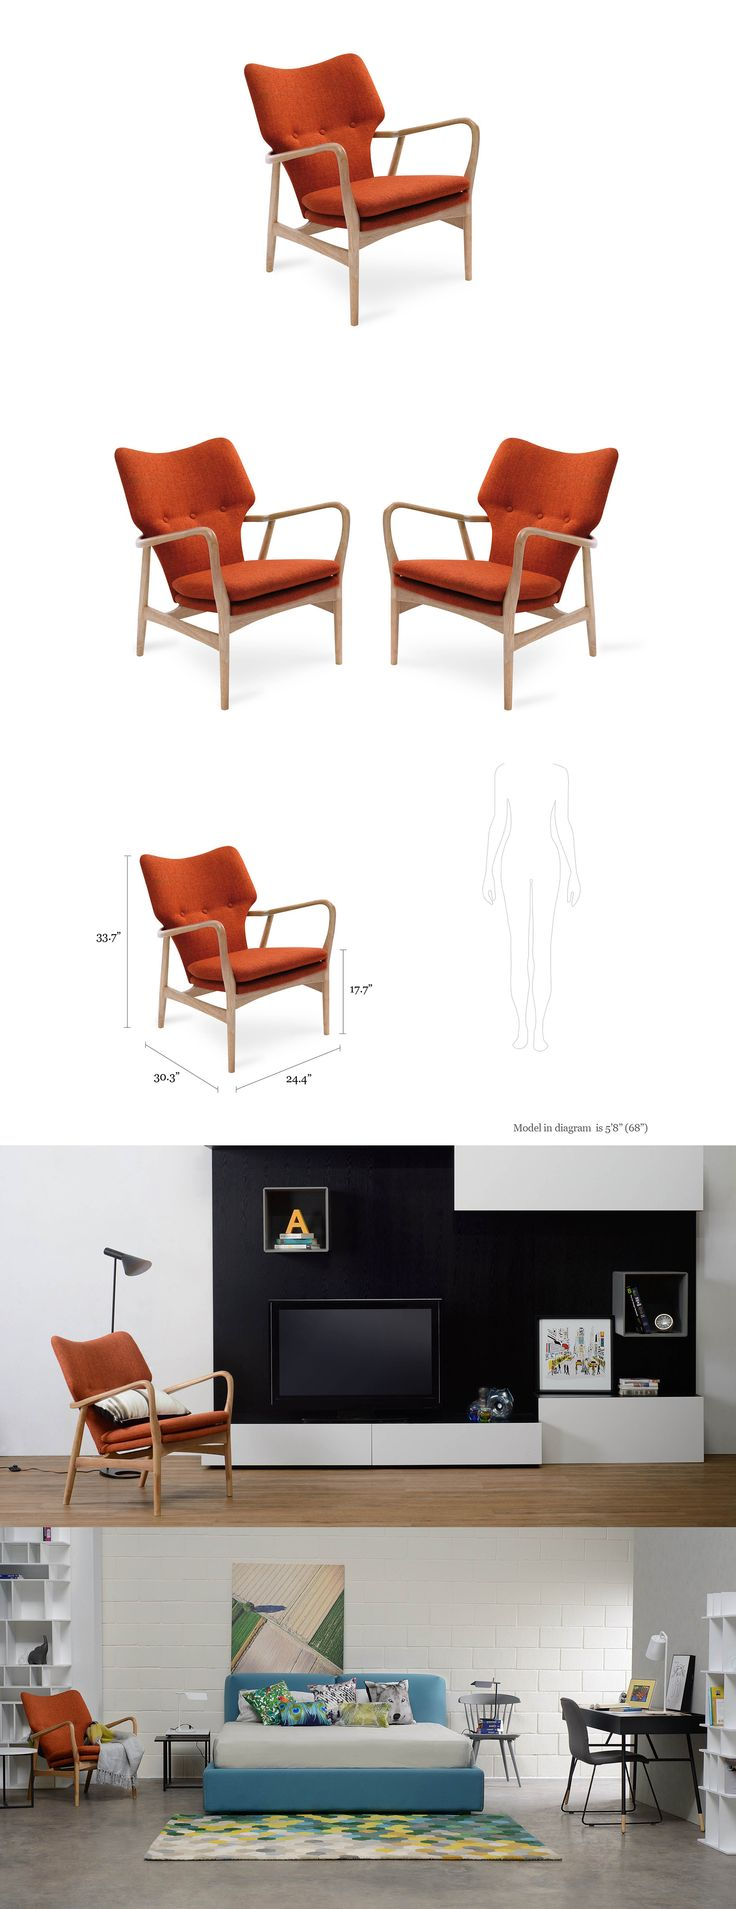 K 252 che k 252 che modern beige k 252 che modern beige k 252 che modern - Modern Mid Century And Scandinavian Furniture Rn